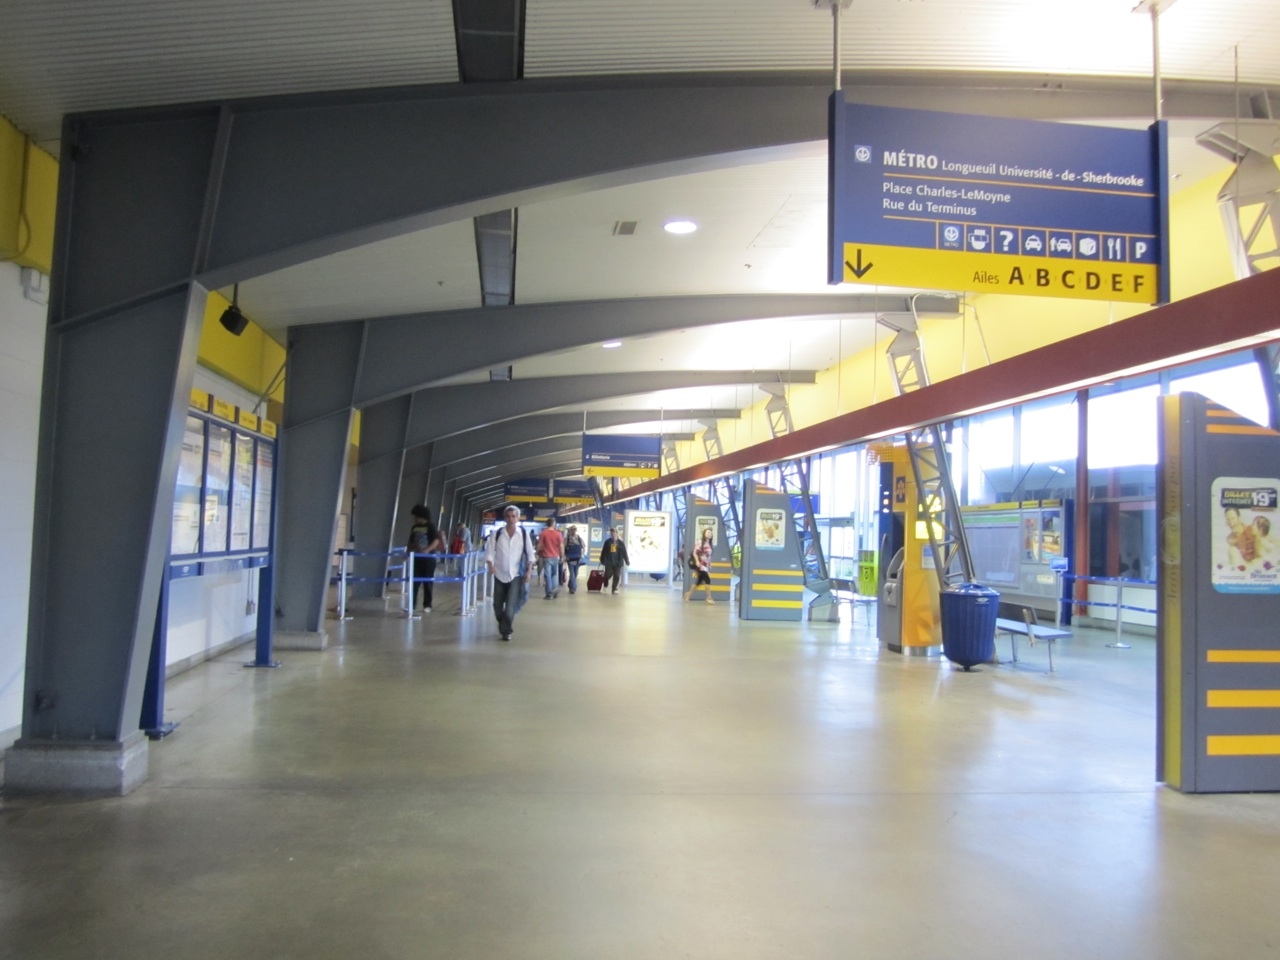 The Metro Station